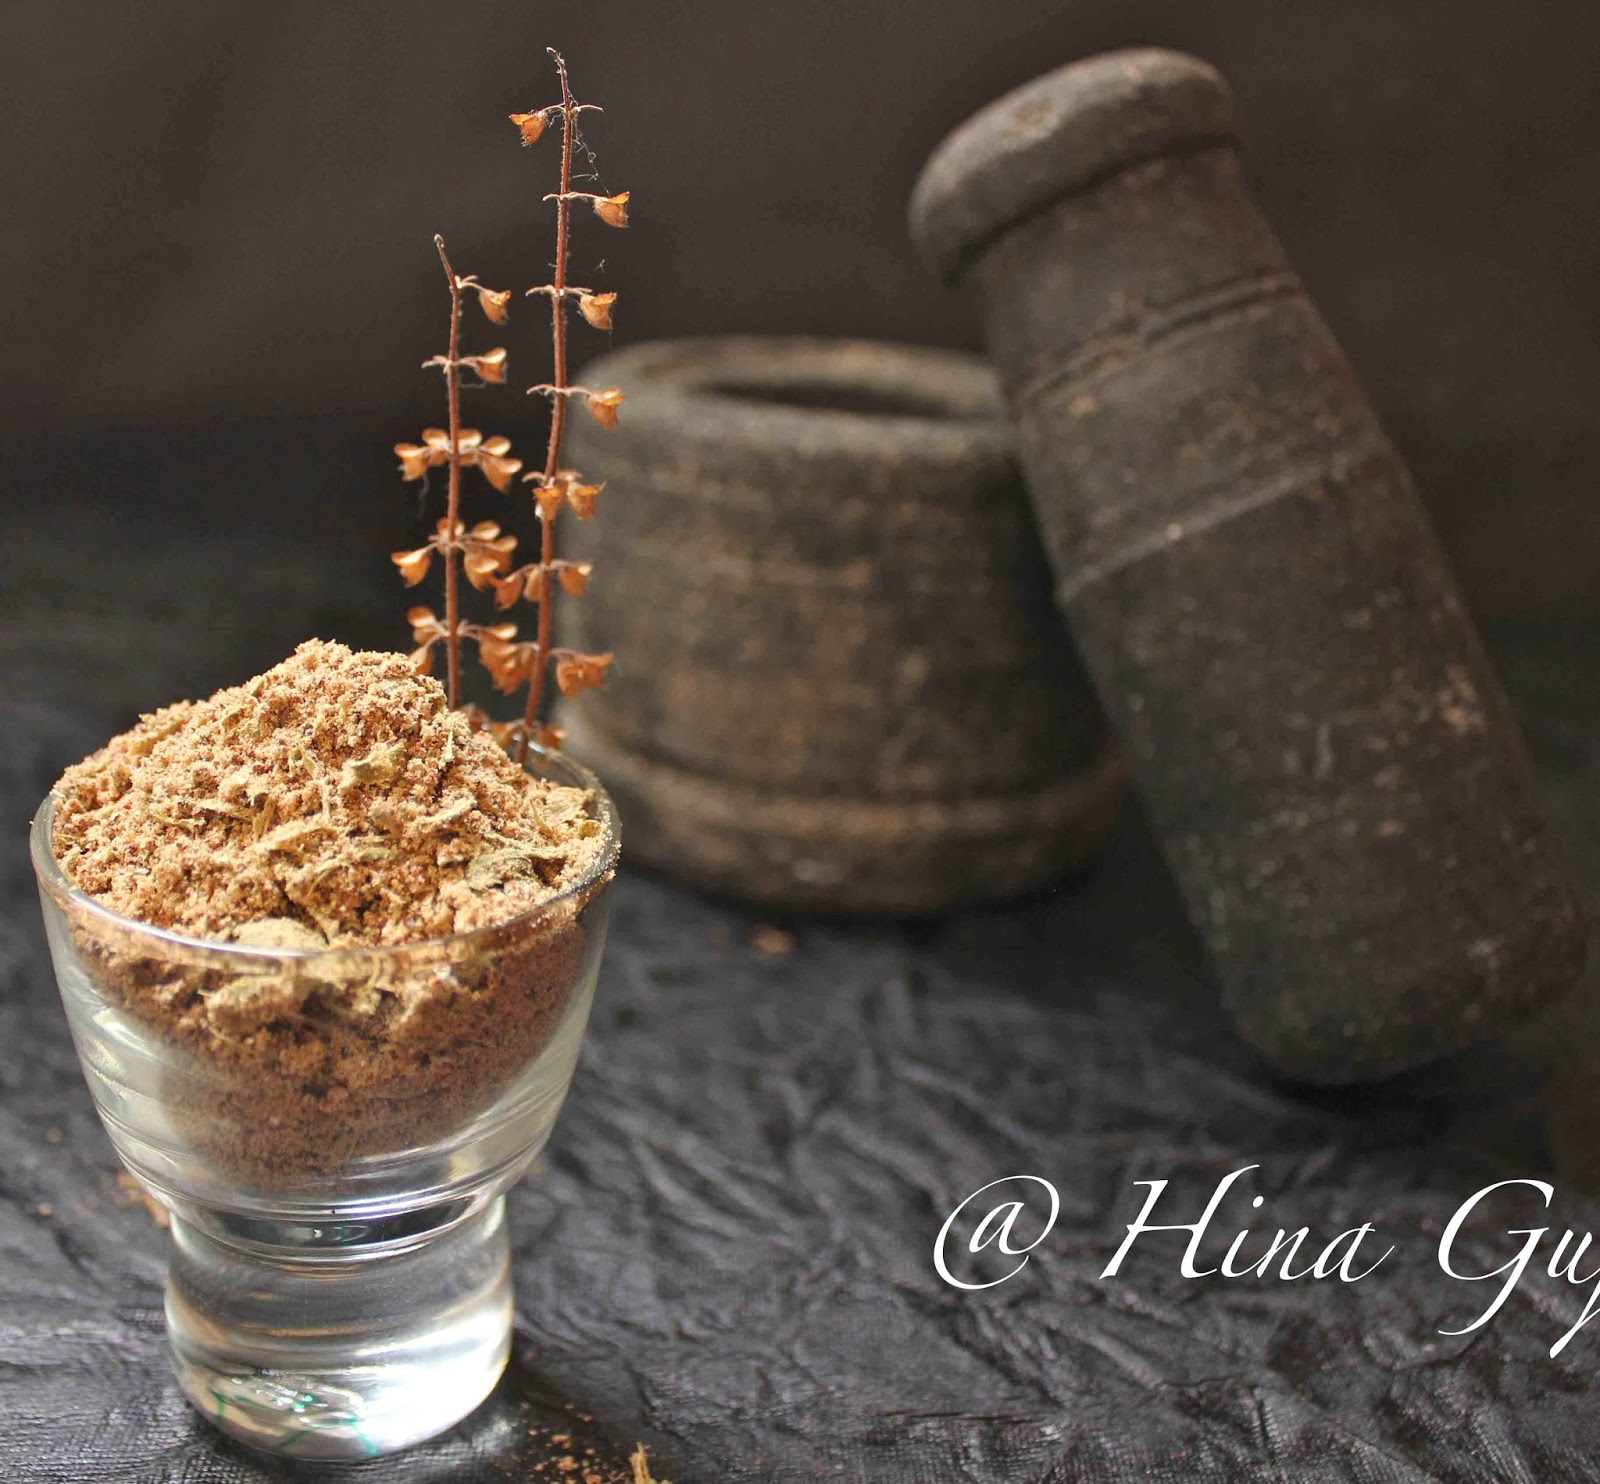 Homemade Chai Ka Masala Recipe (Tea Spice)